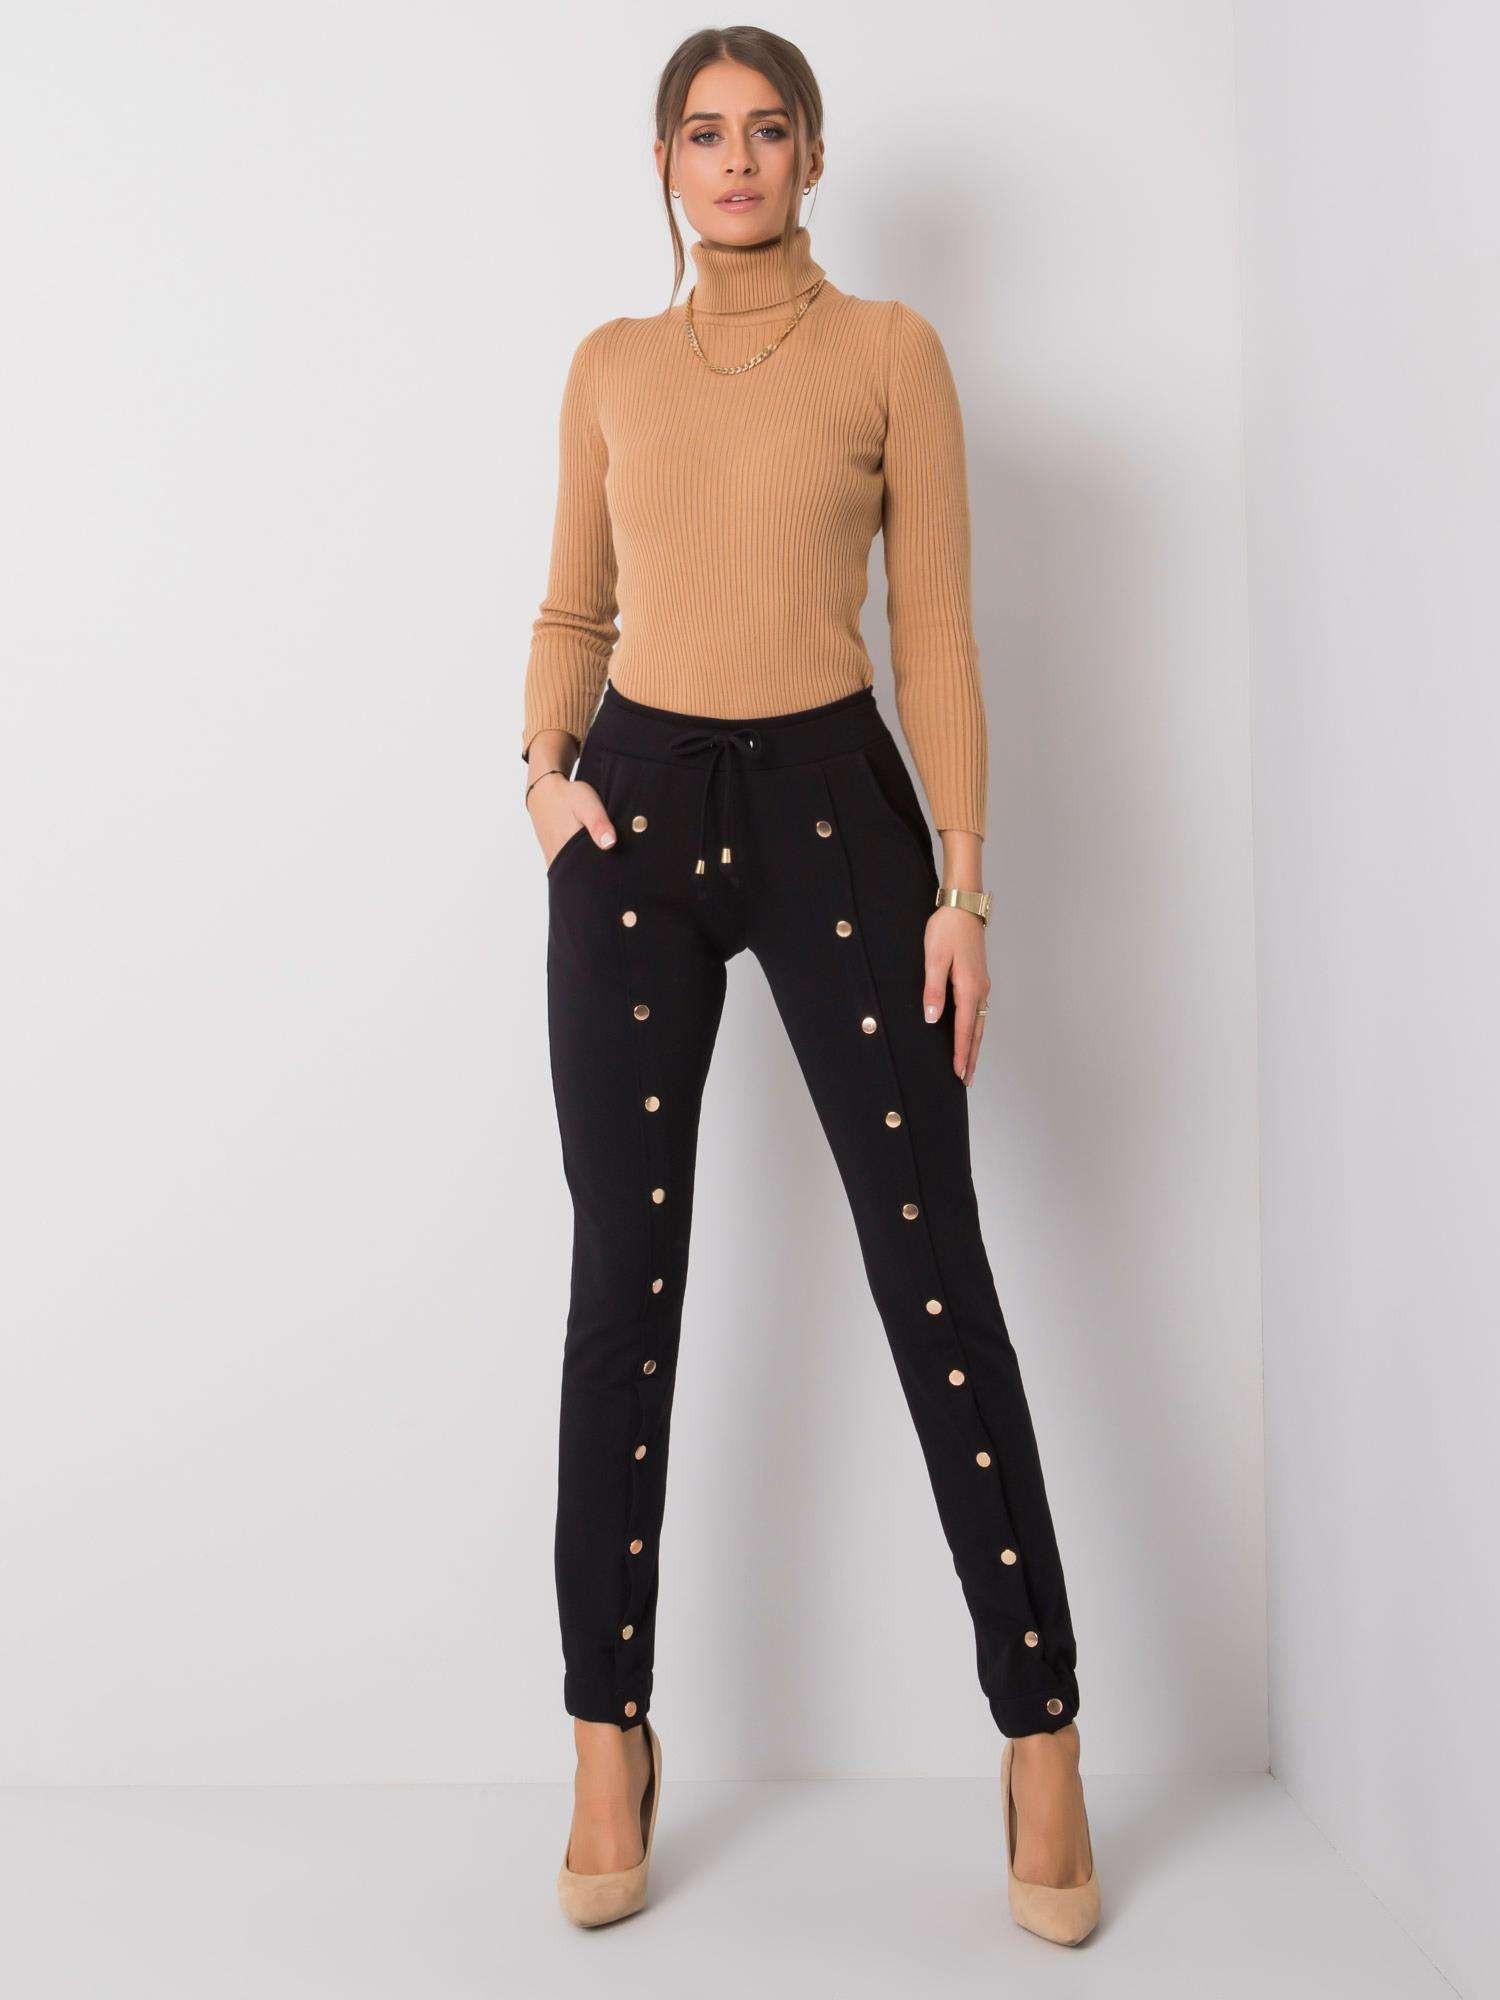 Dámske čierne bavlnené nohavice XL